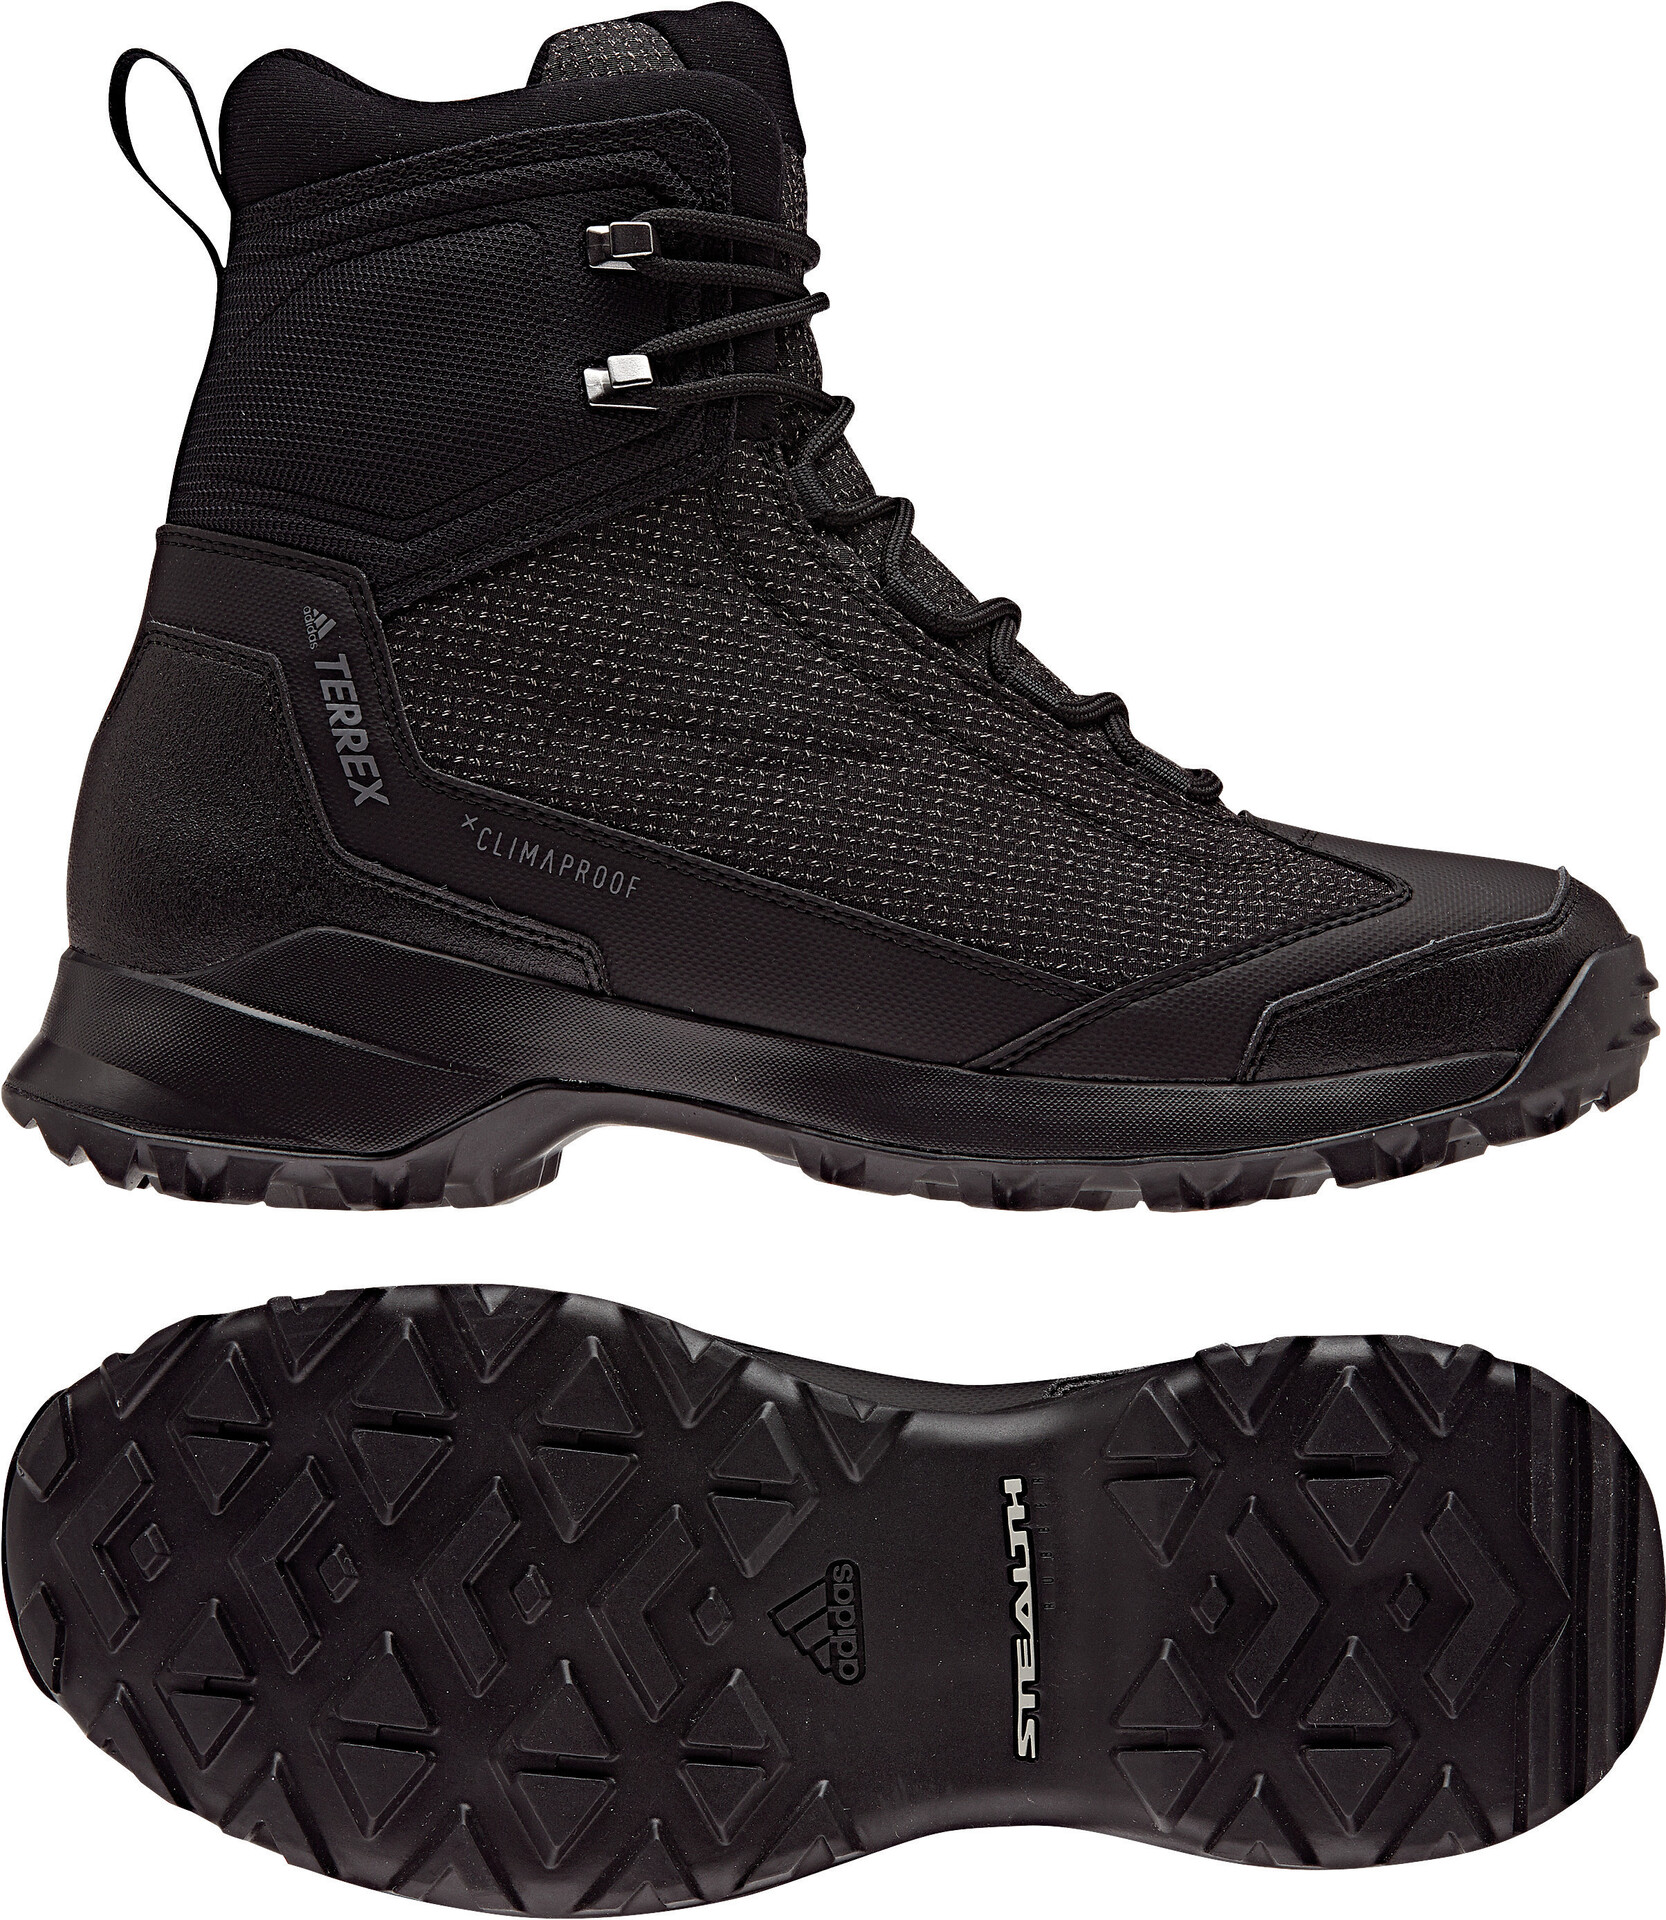 Heron Montantes Adidas Terrex D'hiver Black HommeCore Chaussures nXNOP80wk